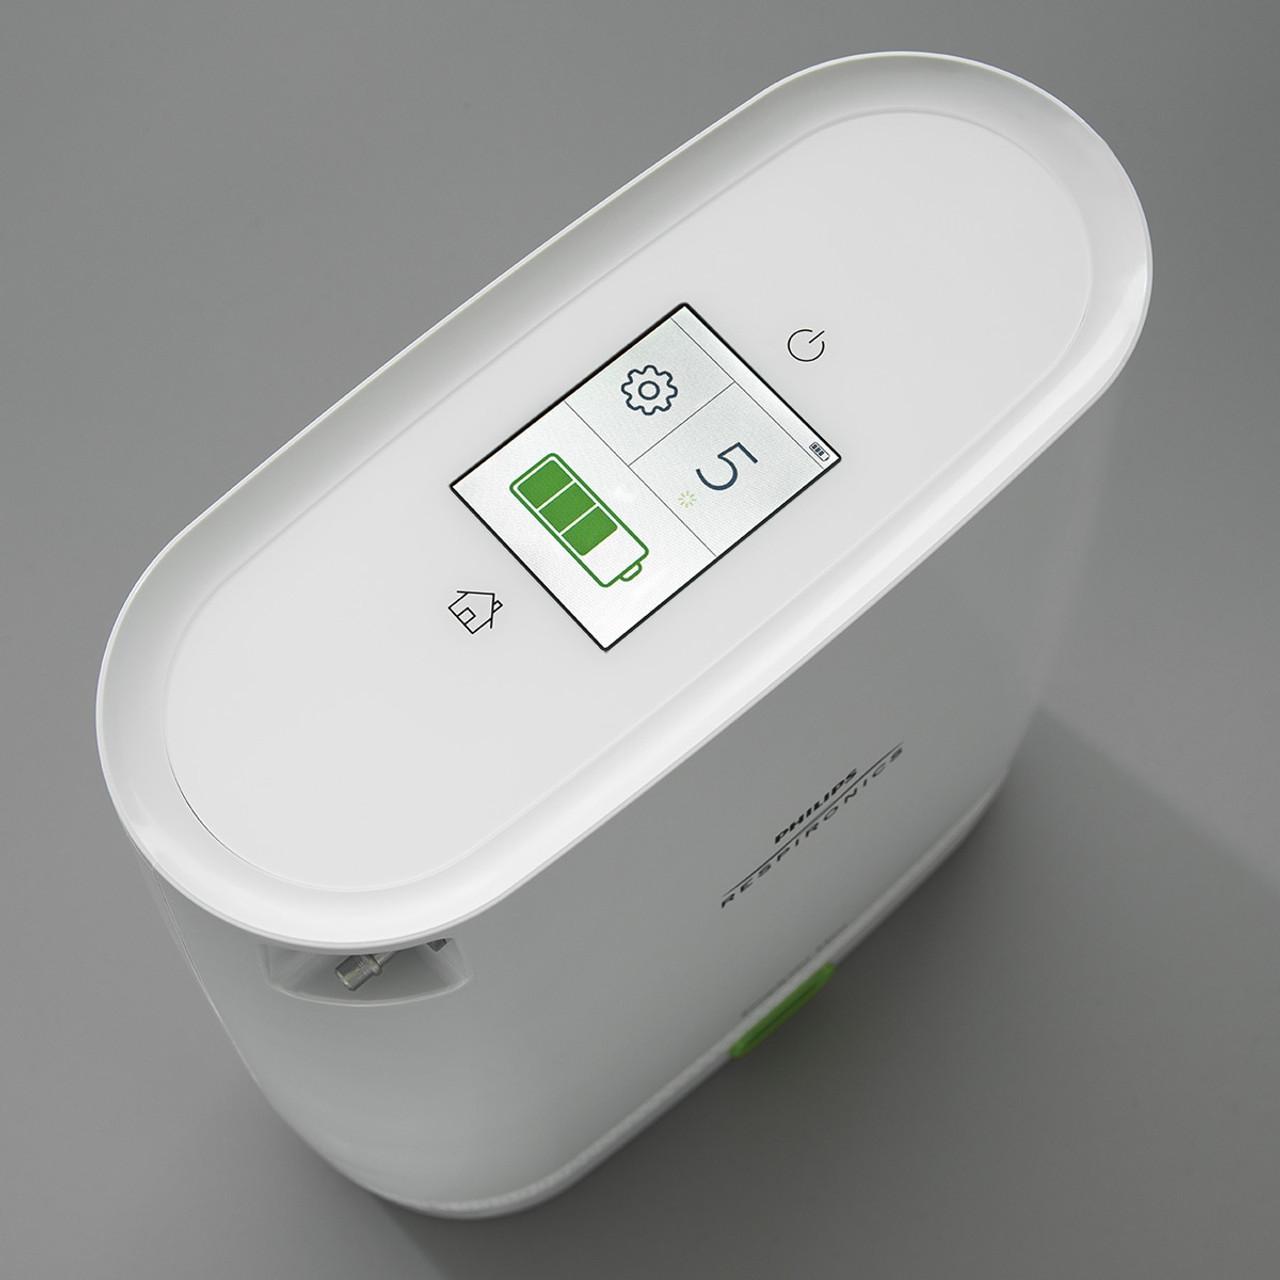 Philips Respironics SimplyGo Mini Oxygen Concentrator